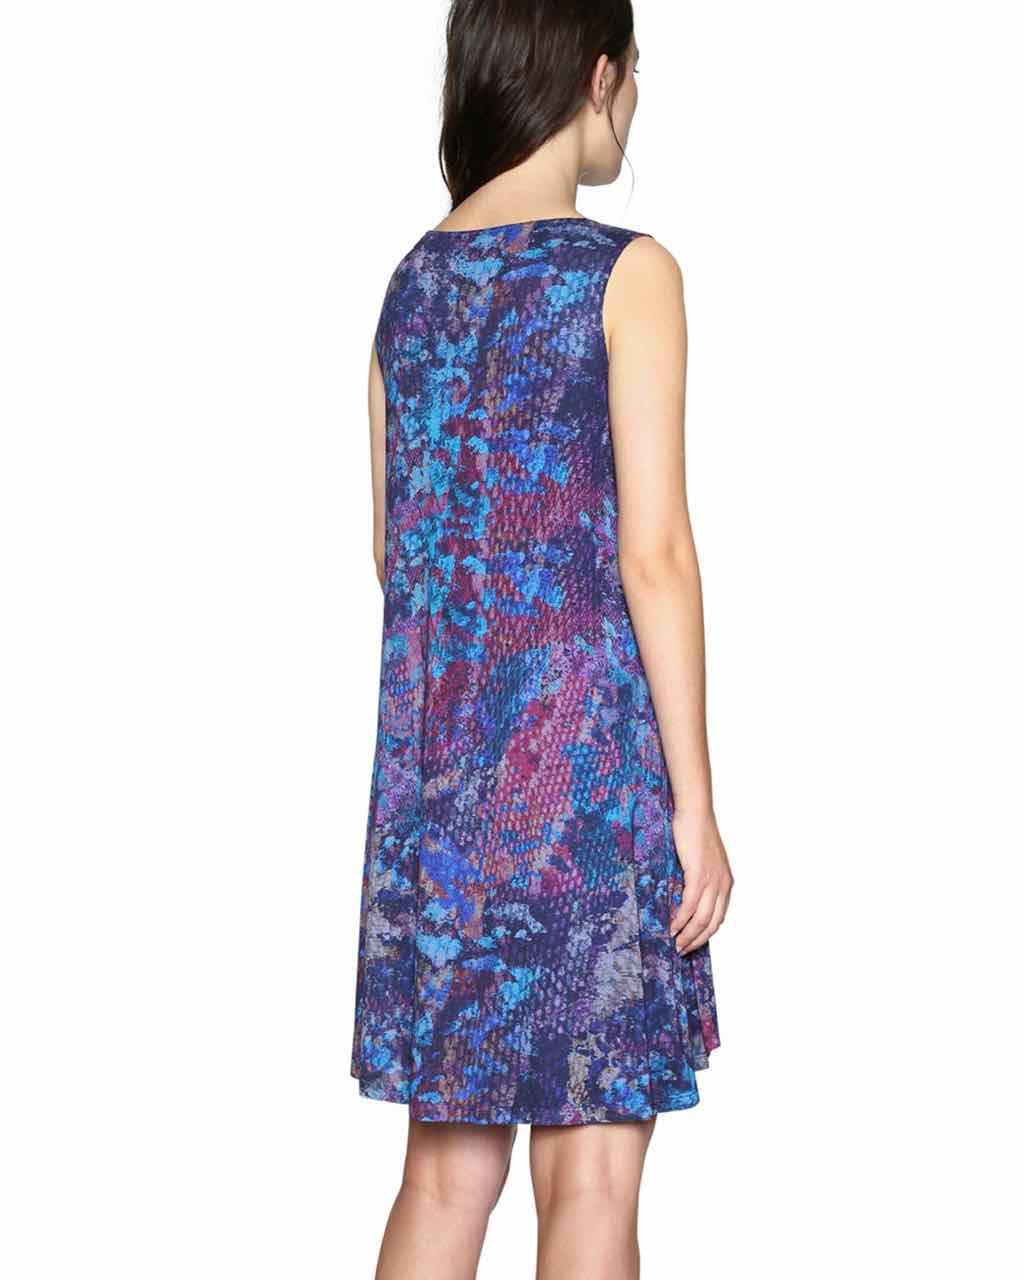 Desigual Dress Eric 18swvka9 Blue Buy Online Canada Usa